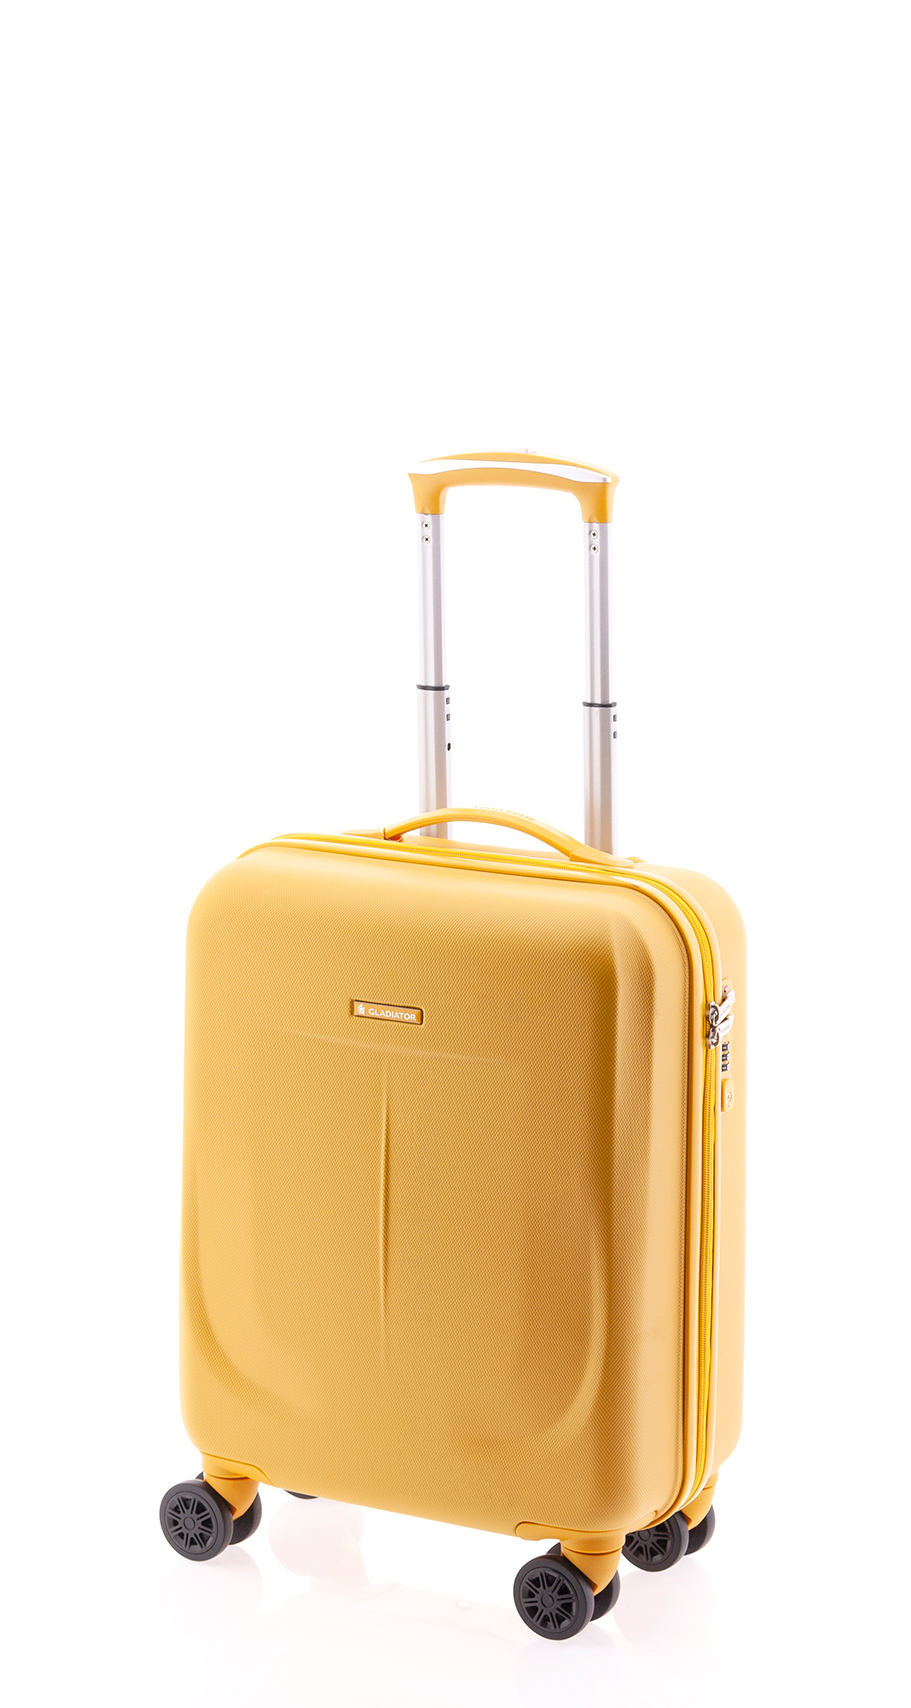 maletas-gladiator-opera-pequeña-cabin-amarila-531006